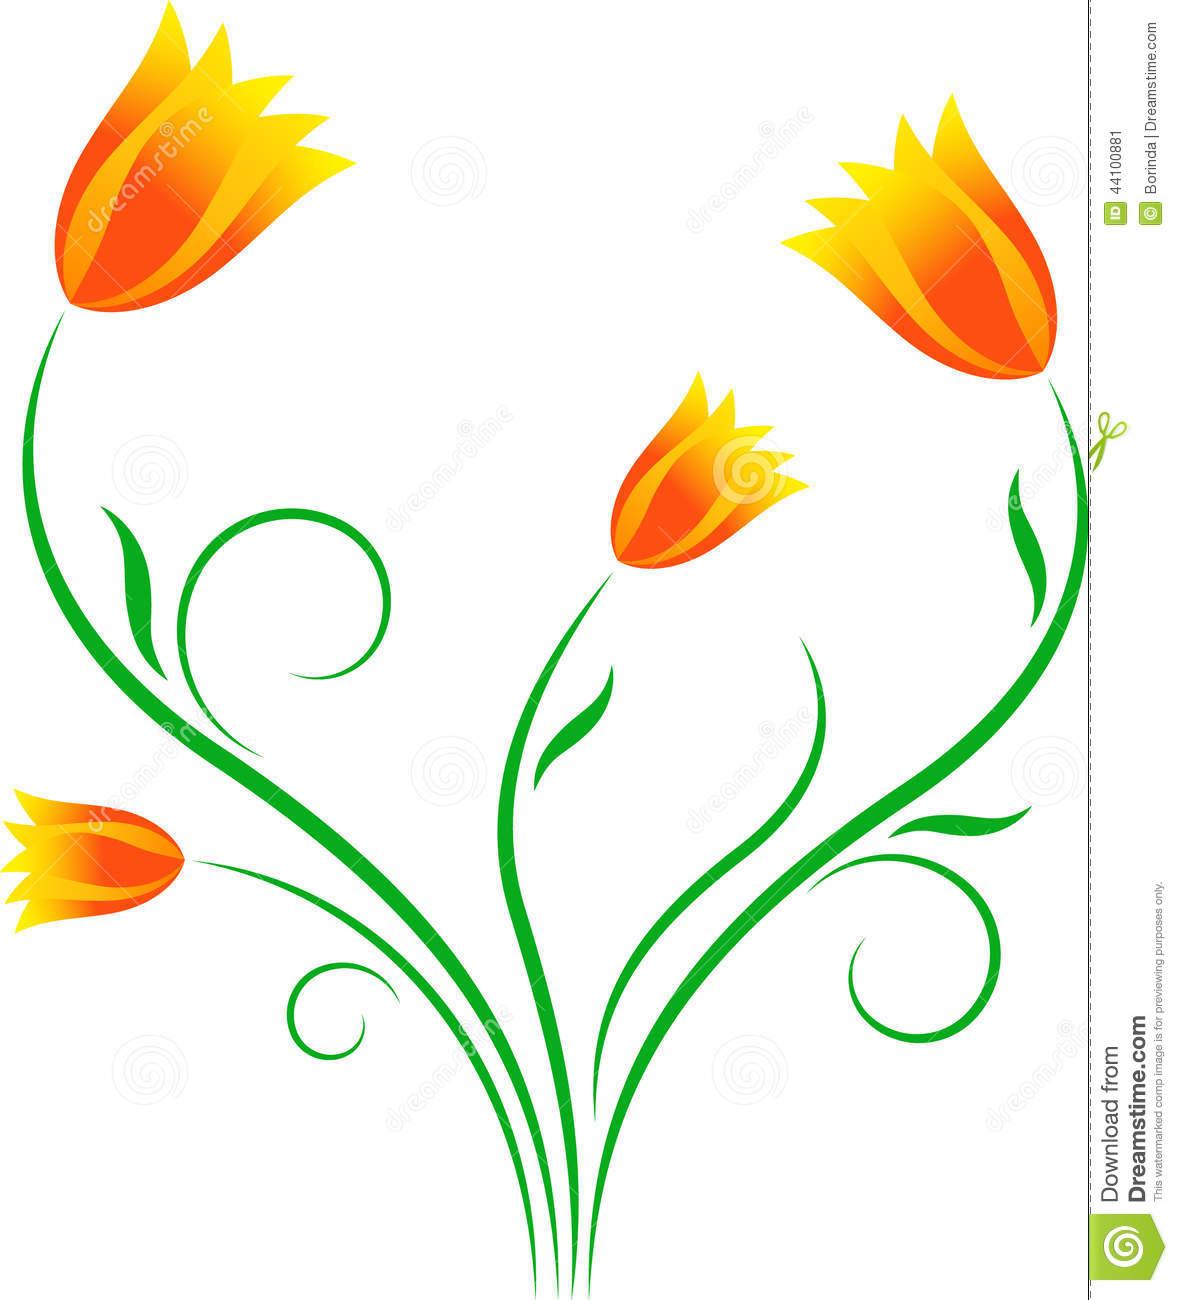 Yellow Tulips, Orange Tulips, Flowers Illustration Stock.